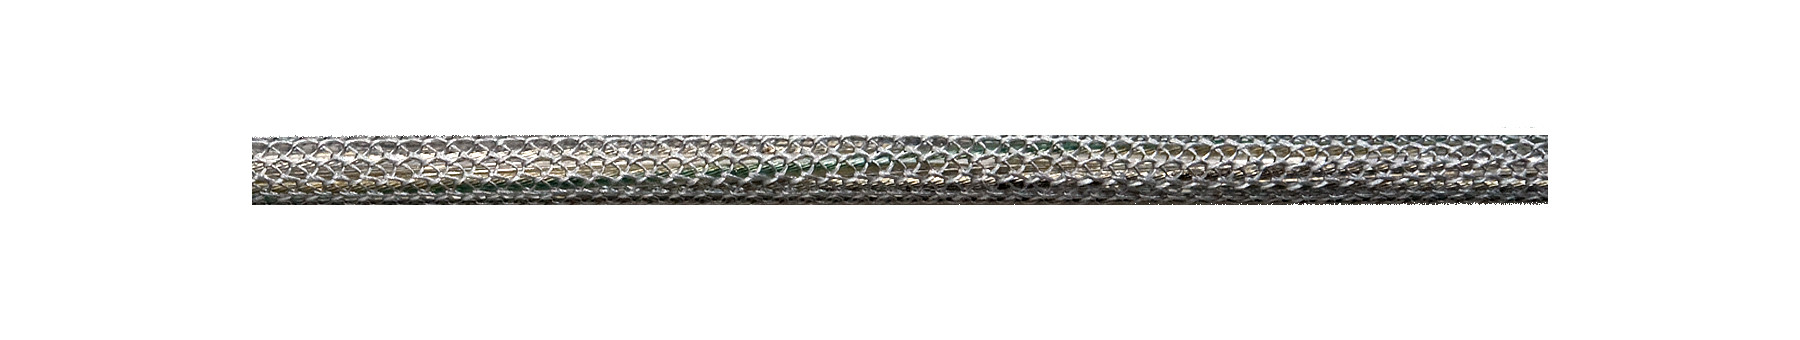 Textilkabel Silber-Grau Netzartiger Textilmantel